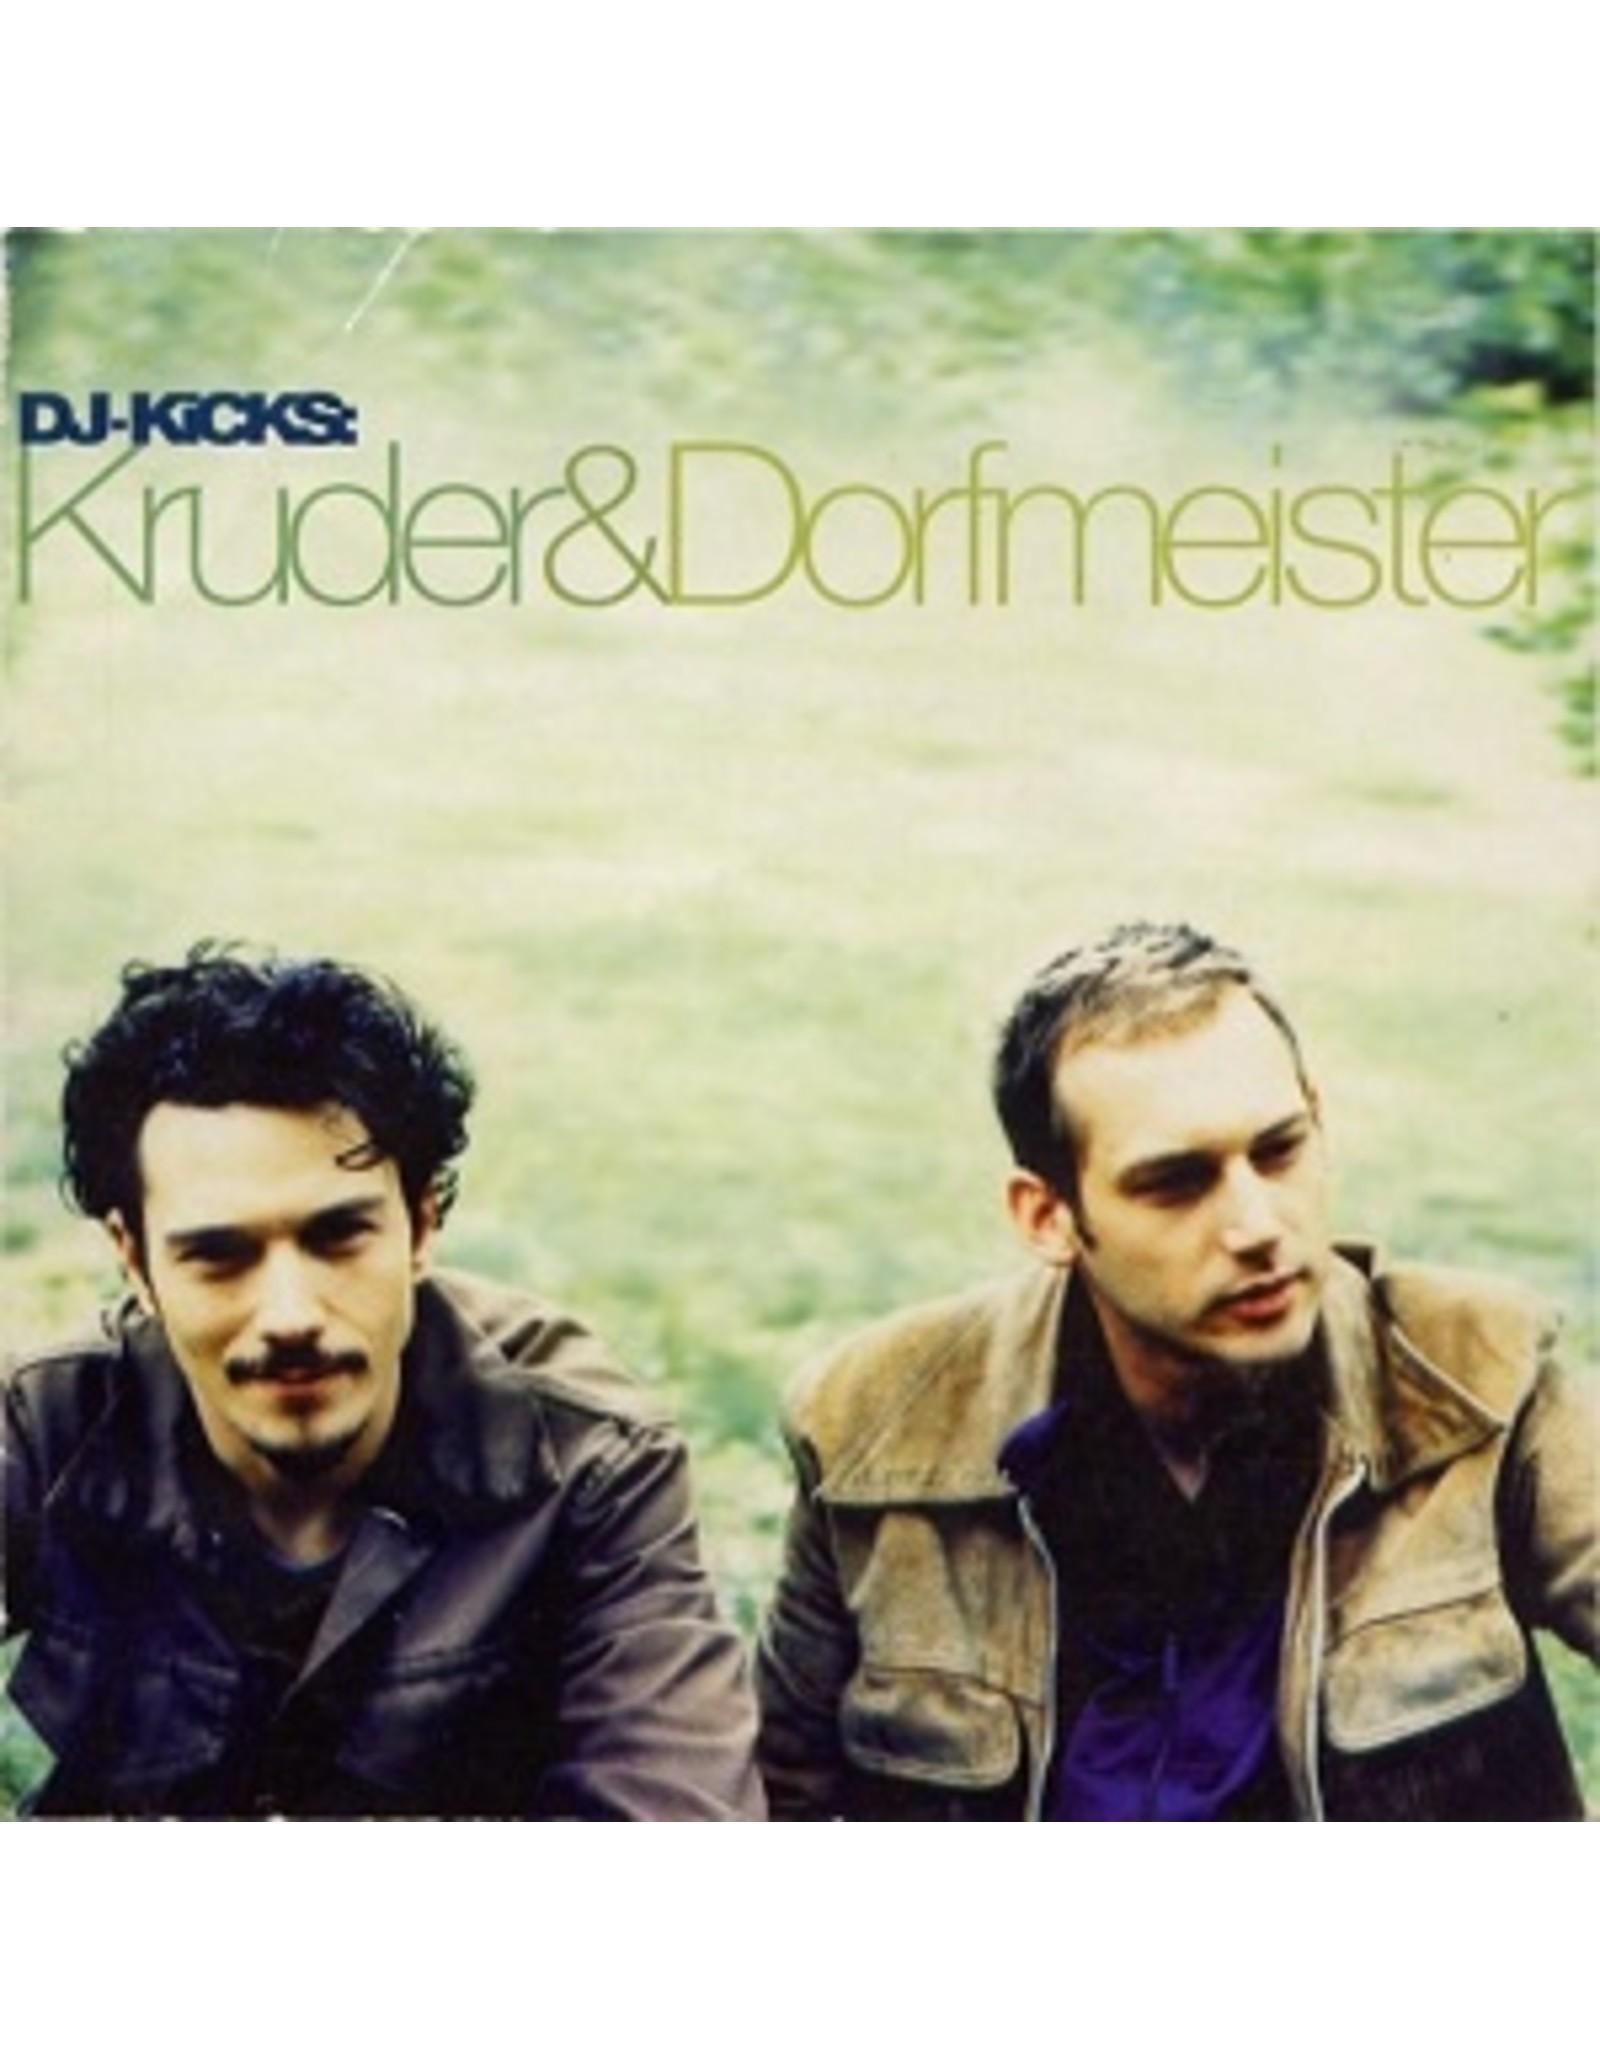 New Vinyl Kruder & Dorfmeister - DJ Kicks 2LP